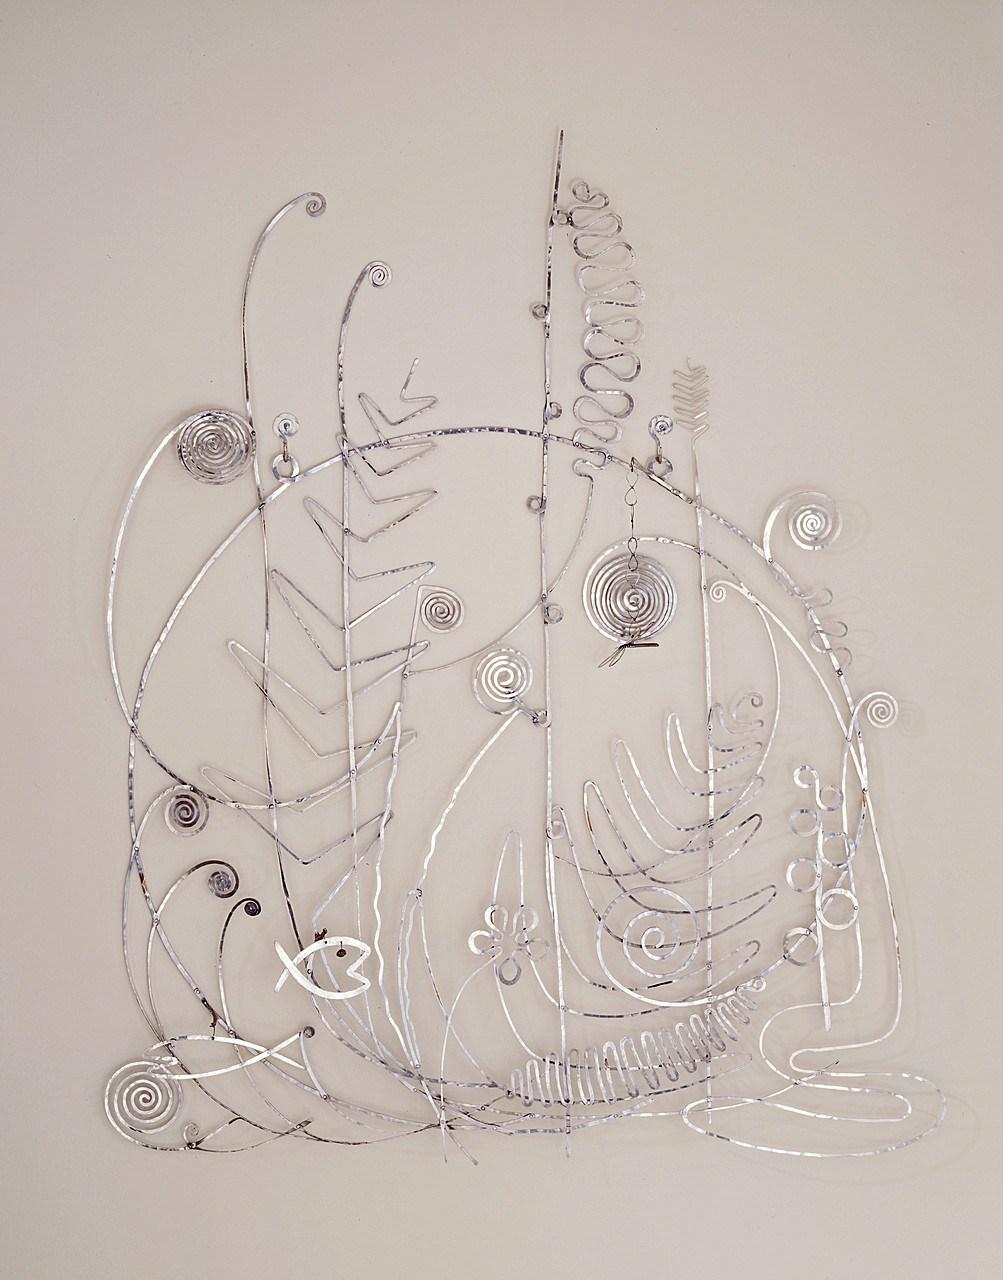 ALEXANDER CALDER, ' The Silver Bedhead'  The Solomon R. Guggenheim Foundation Peggy Guggenheim Collection, Venice, 1976  © 2018 Calder Foundation, New York/Artists Rights Society (ARS), New York